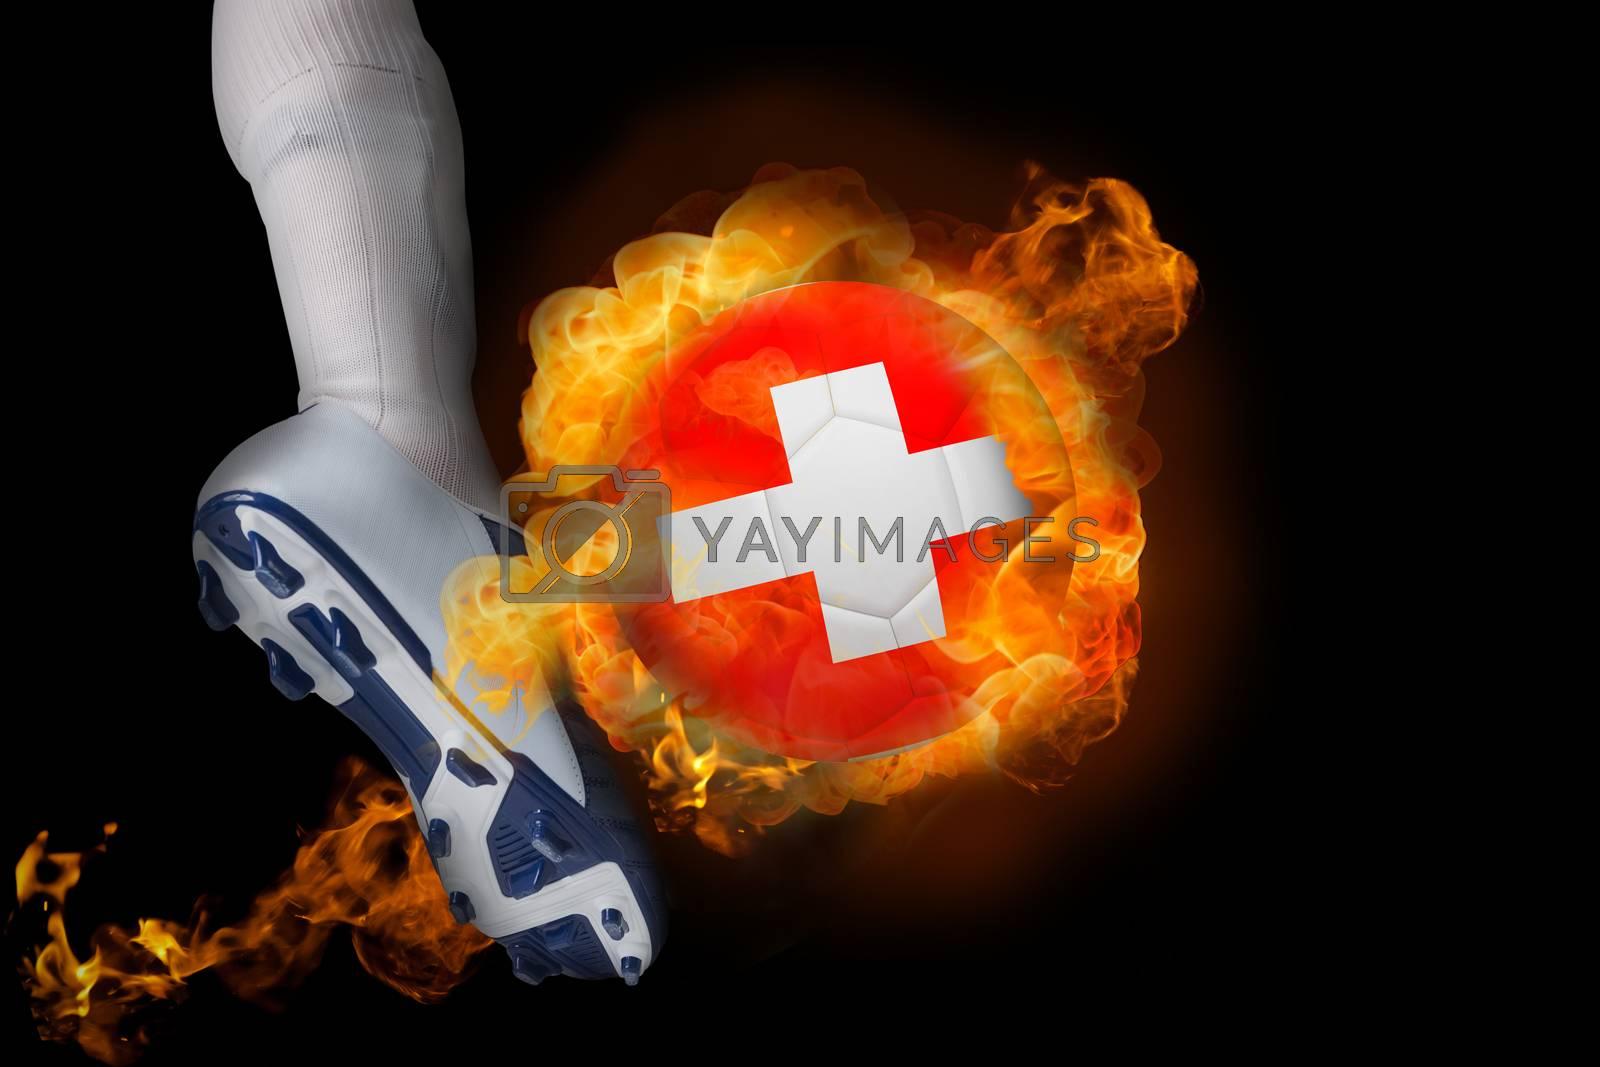 Football player kicking flaming switzerland ball by Wavebreakmedia